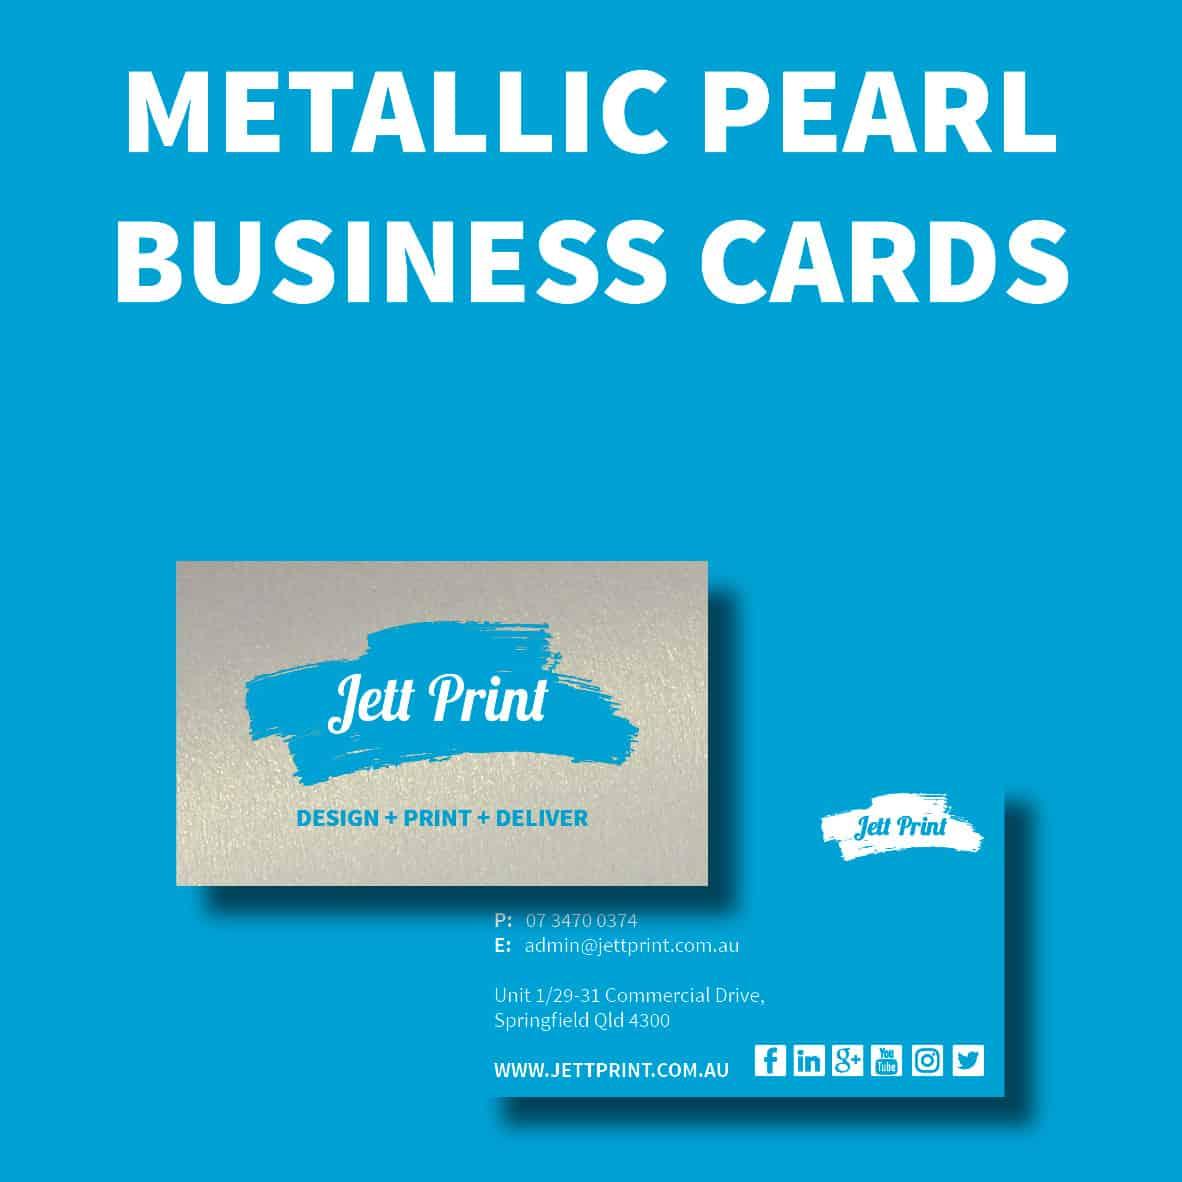 metallic-pearl-business-cards-printing-springfield-ipswich-brisbane12